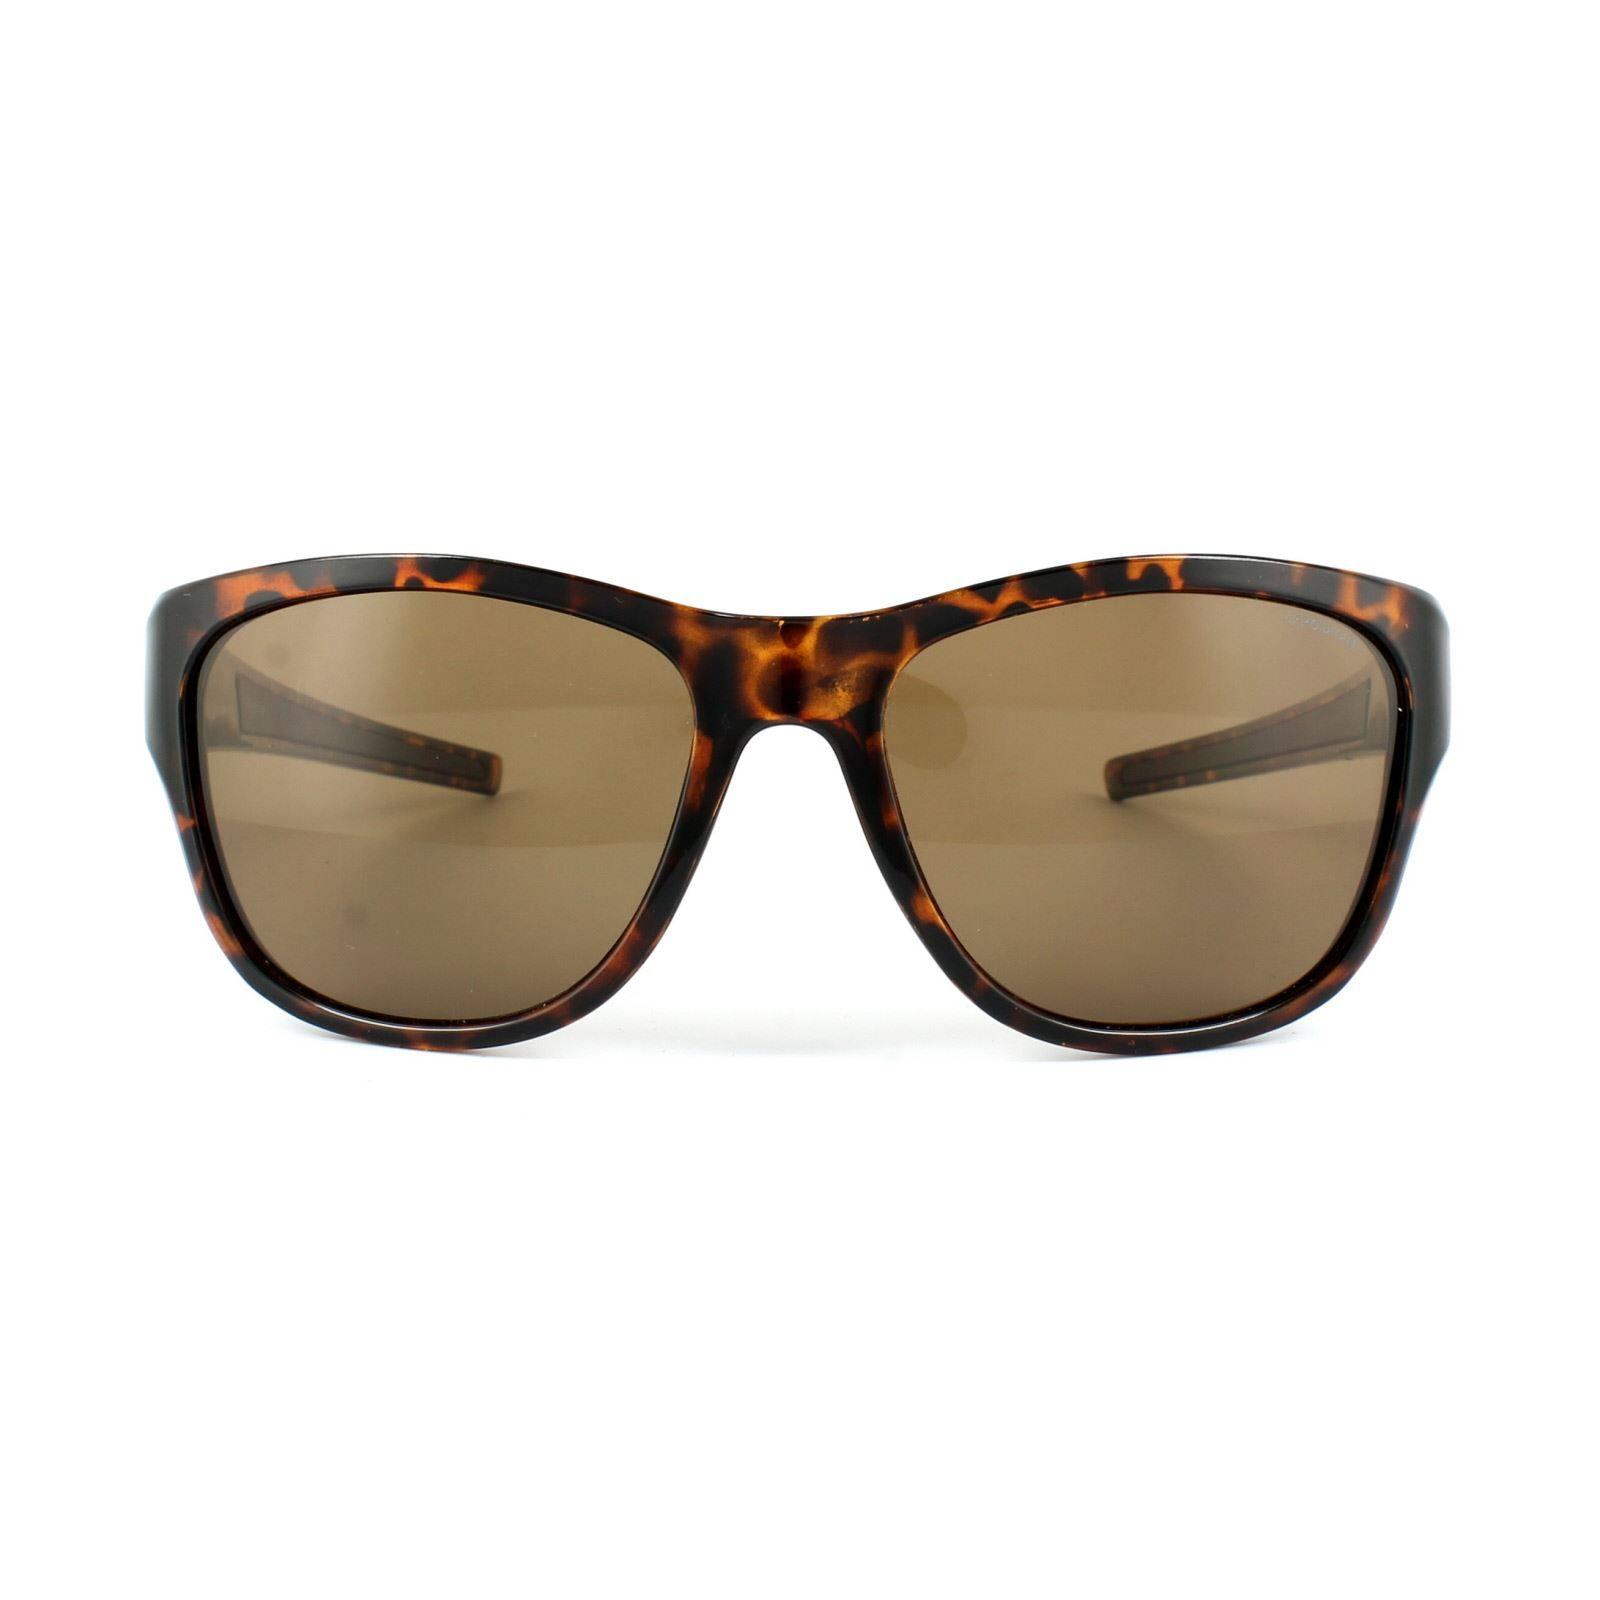 Polaroid Sunglasses PLD 3014S V08 IG Havana Brown Polarized